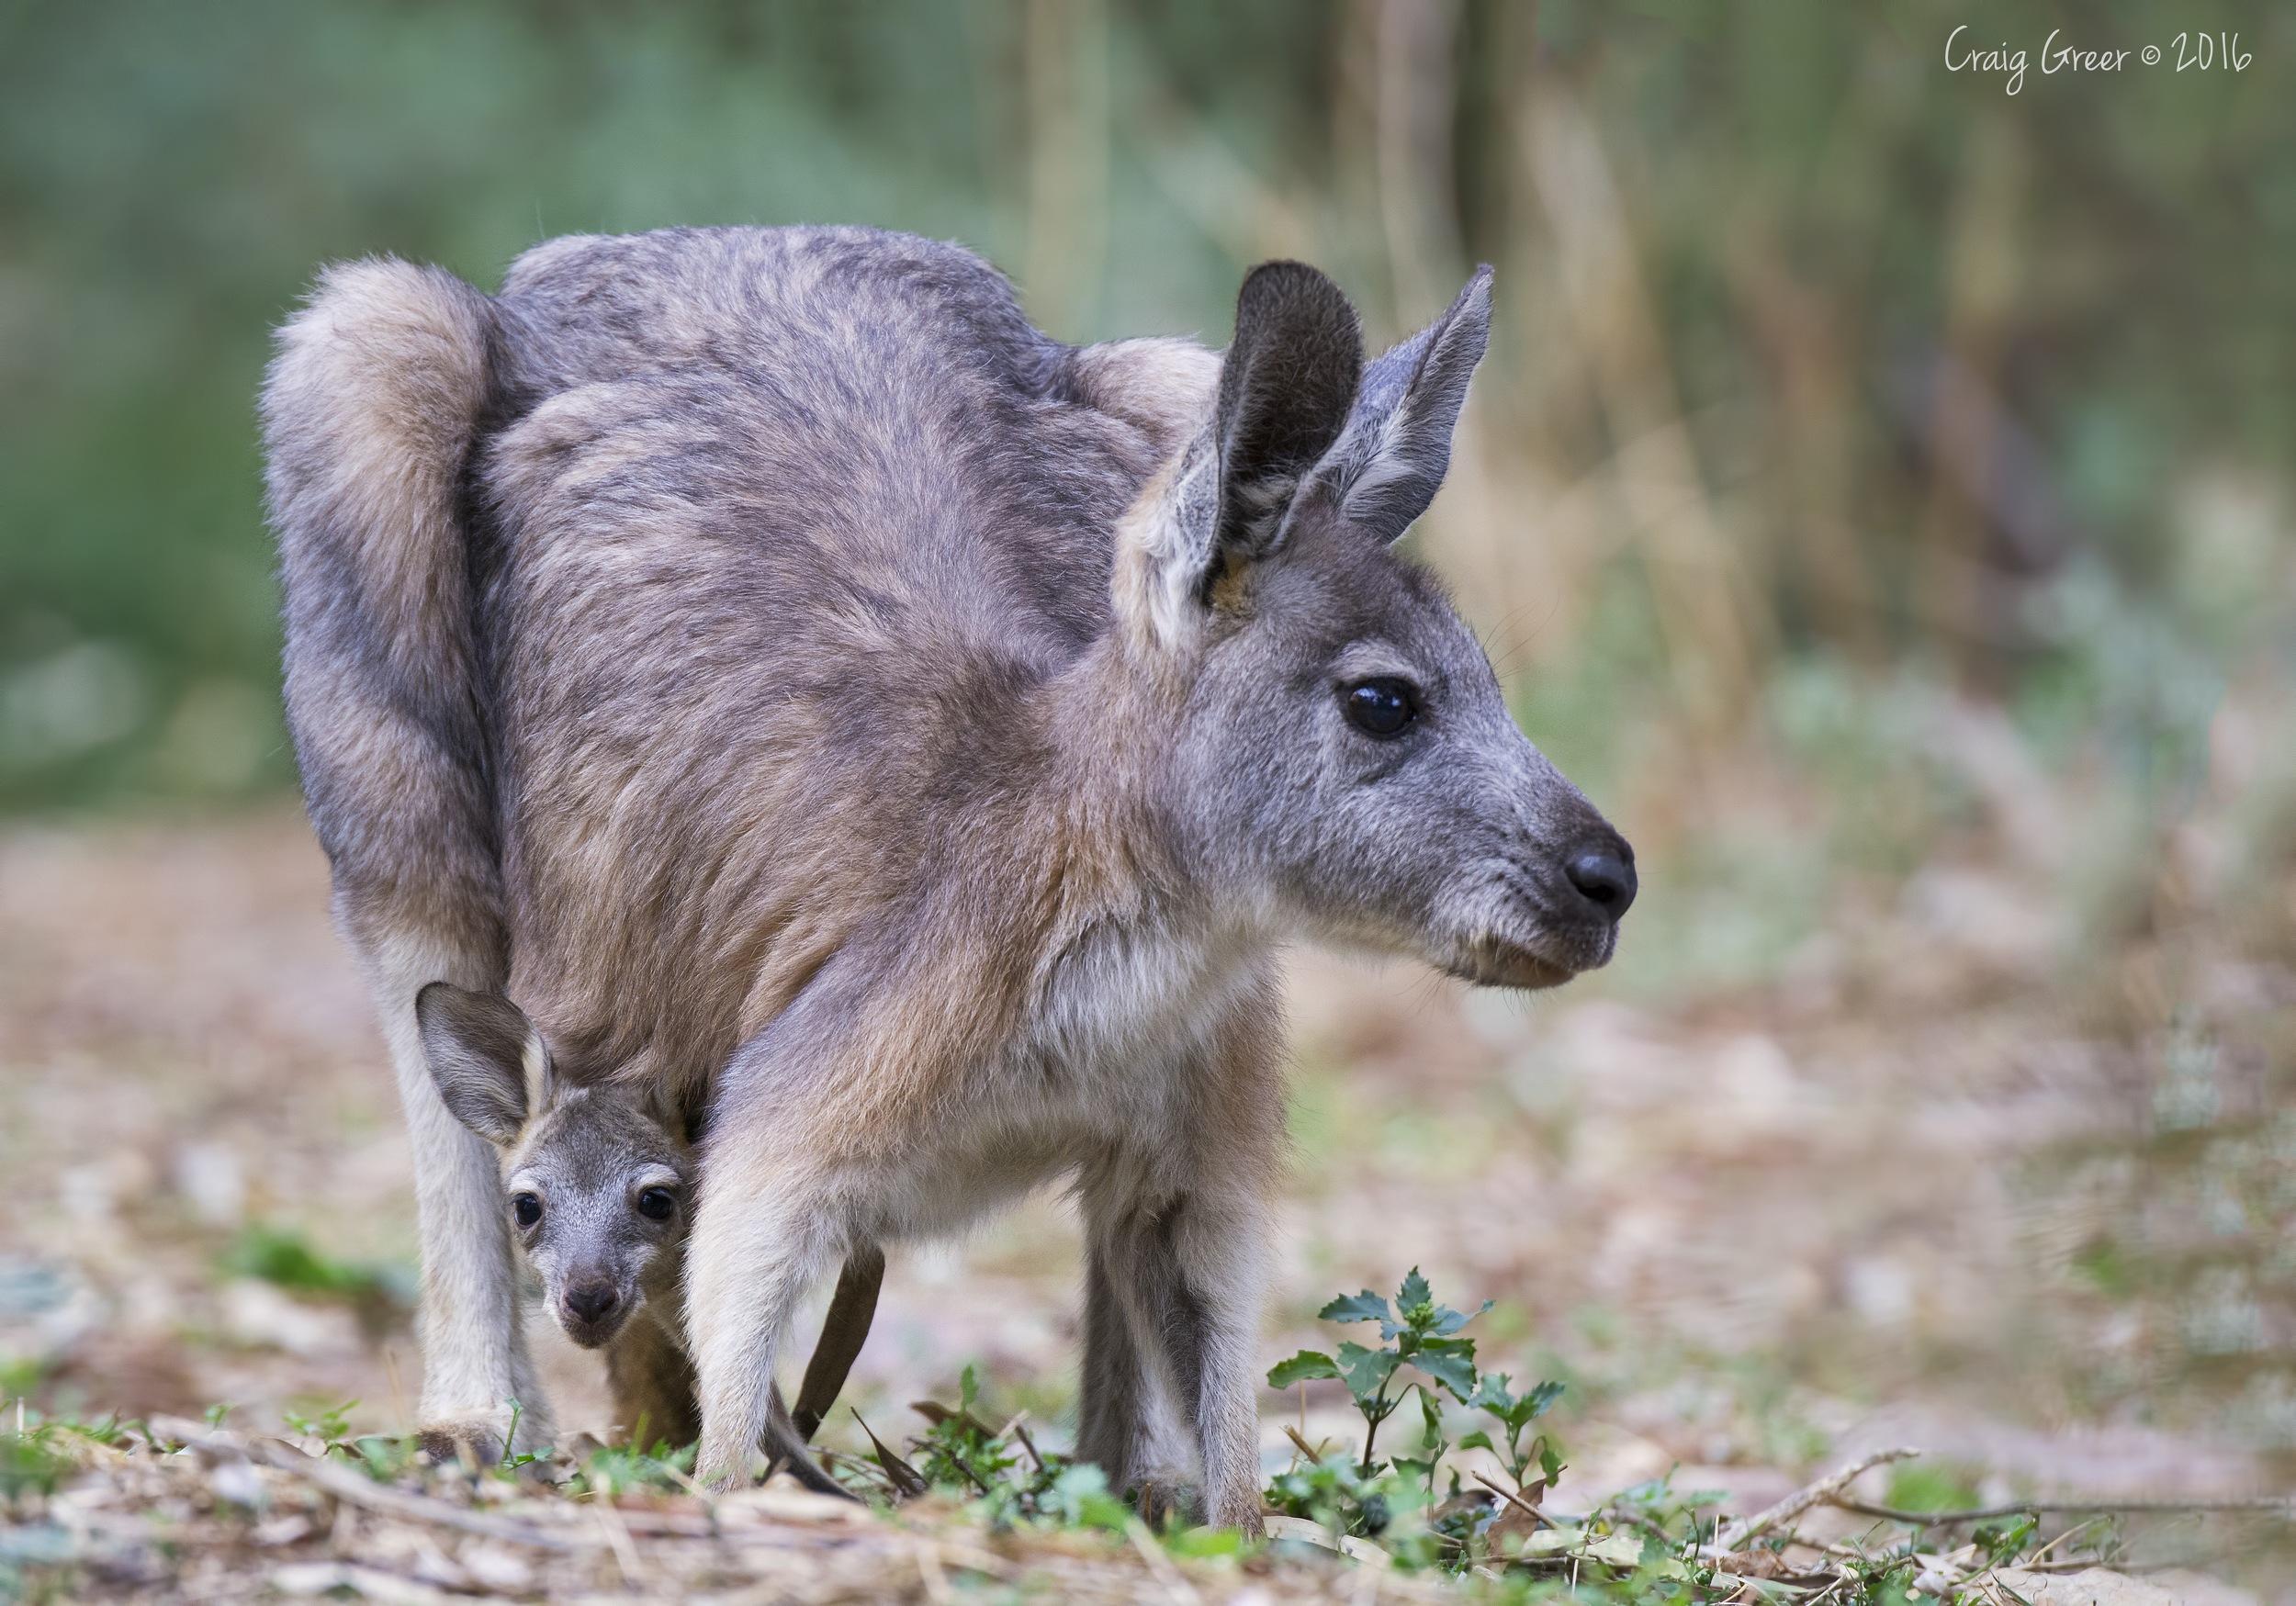 Kangaroo-joey-Mambray-Creek-30-04-16.jpg